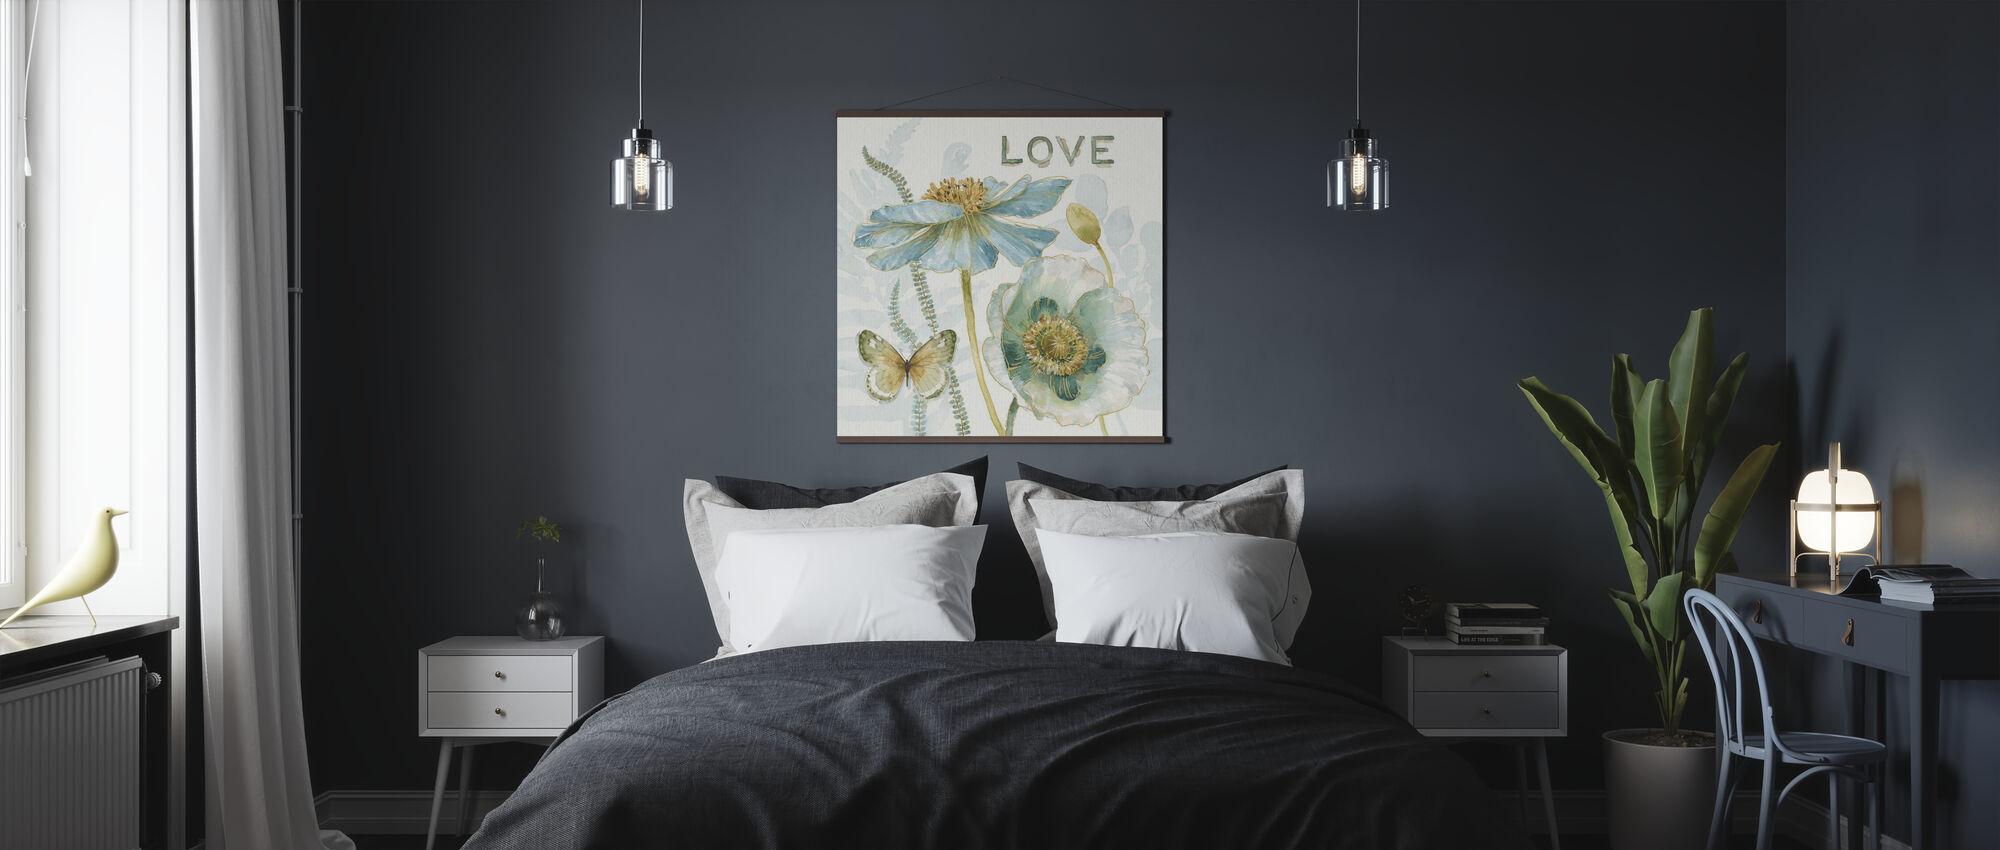 My Greenhouse Flowers - Love - Poster - Bedroom